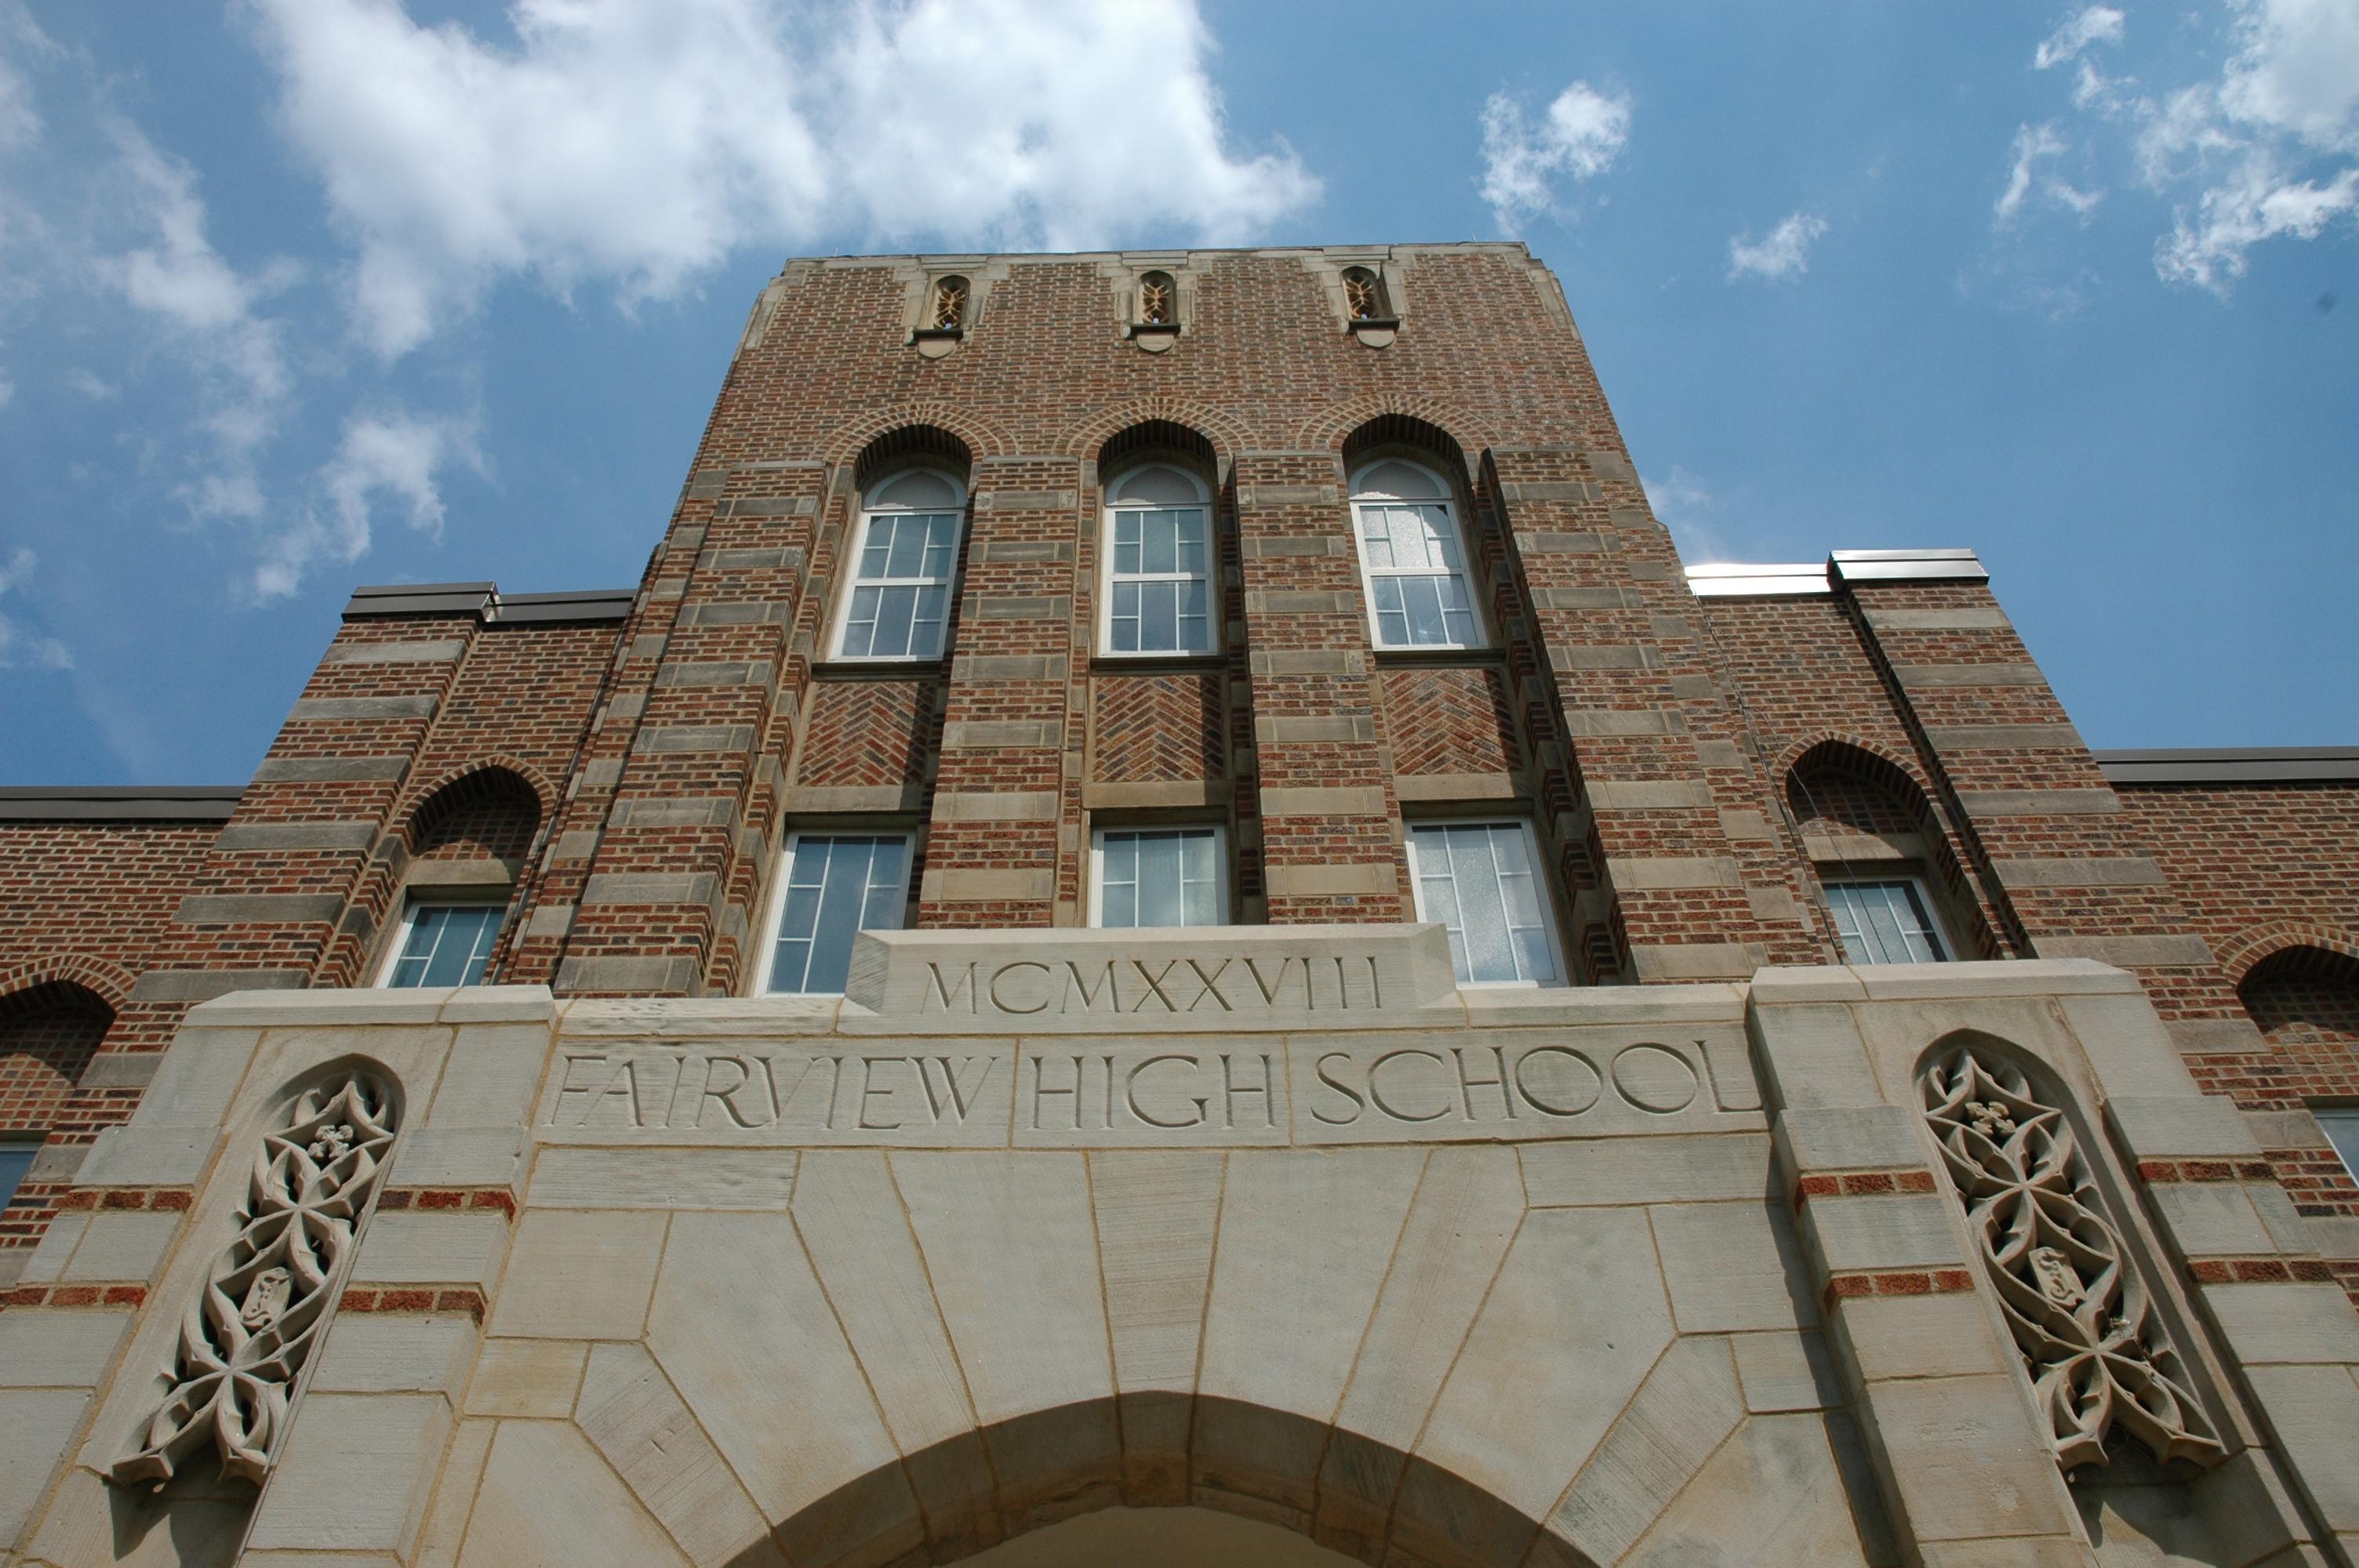 Fairview High School in Fairview Park, Ohio